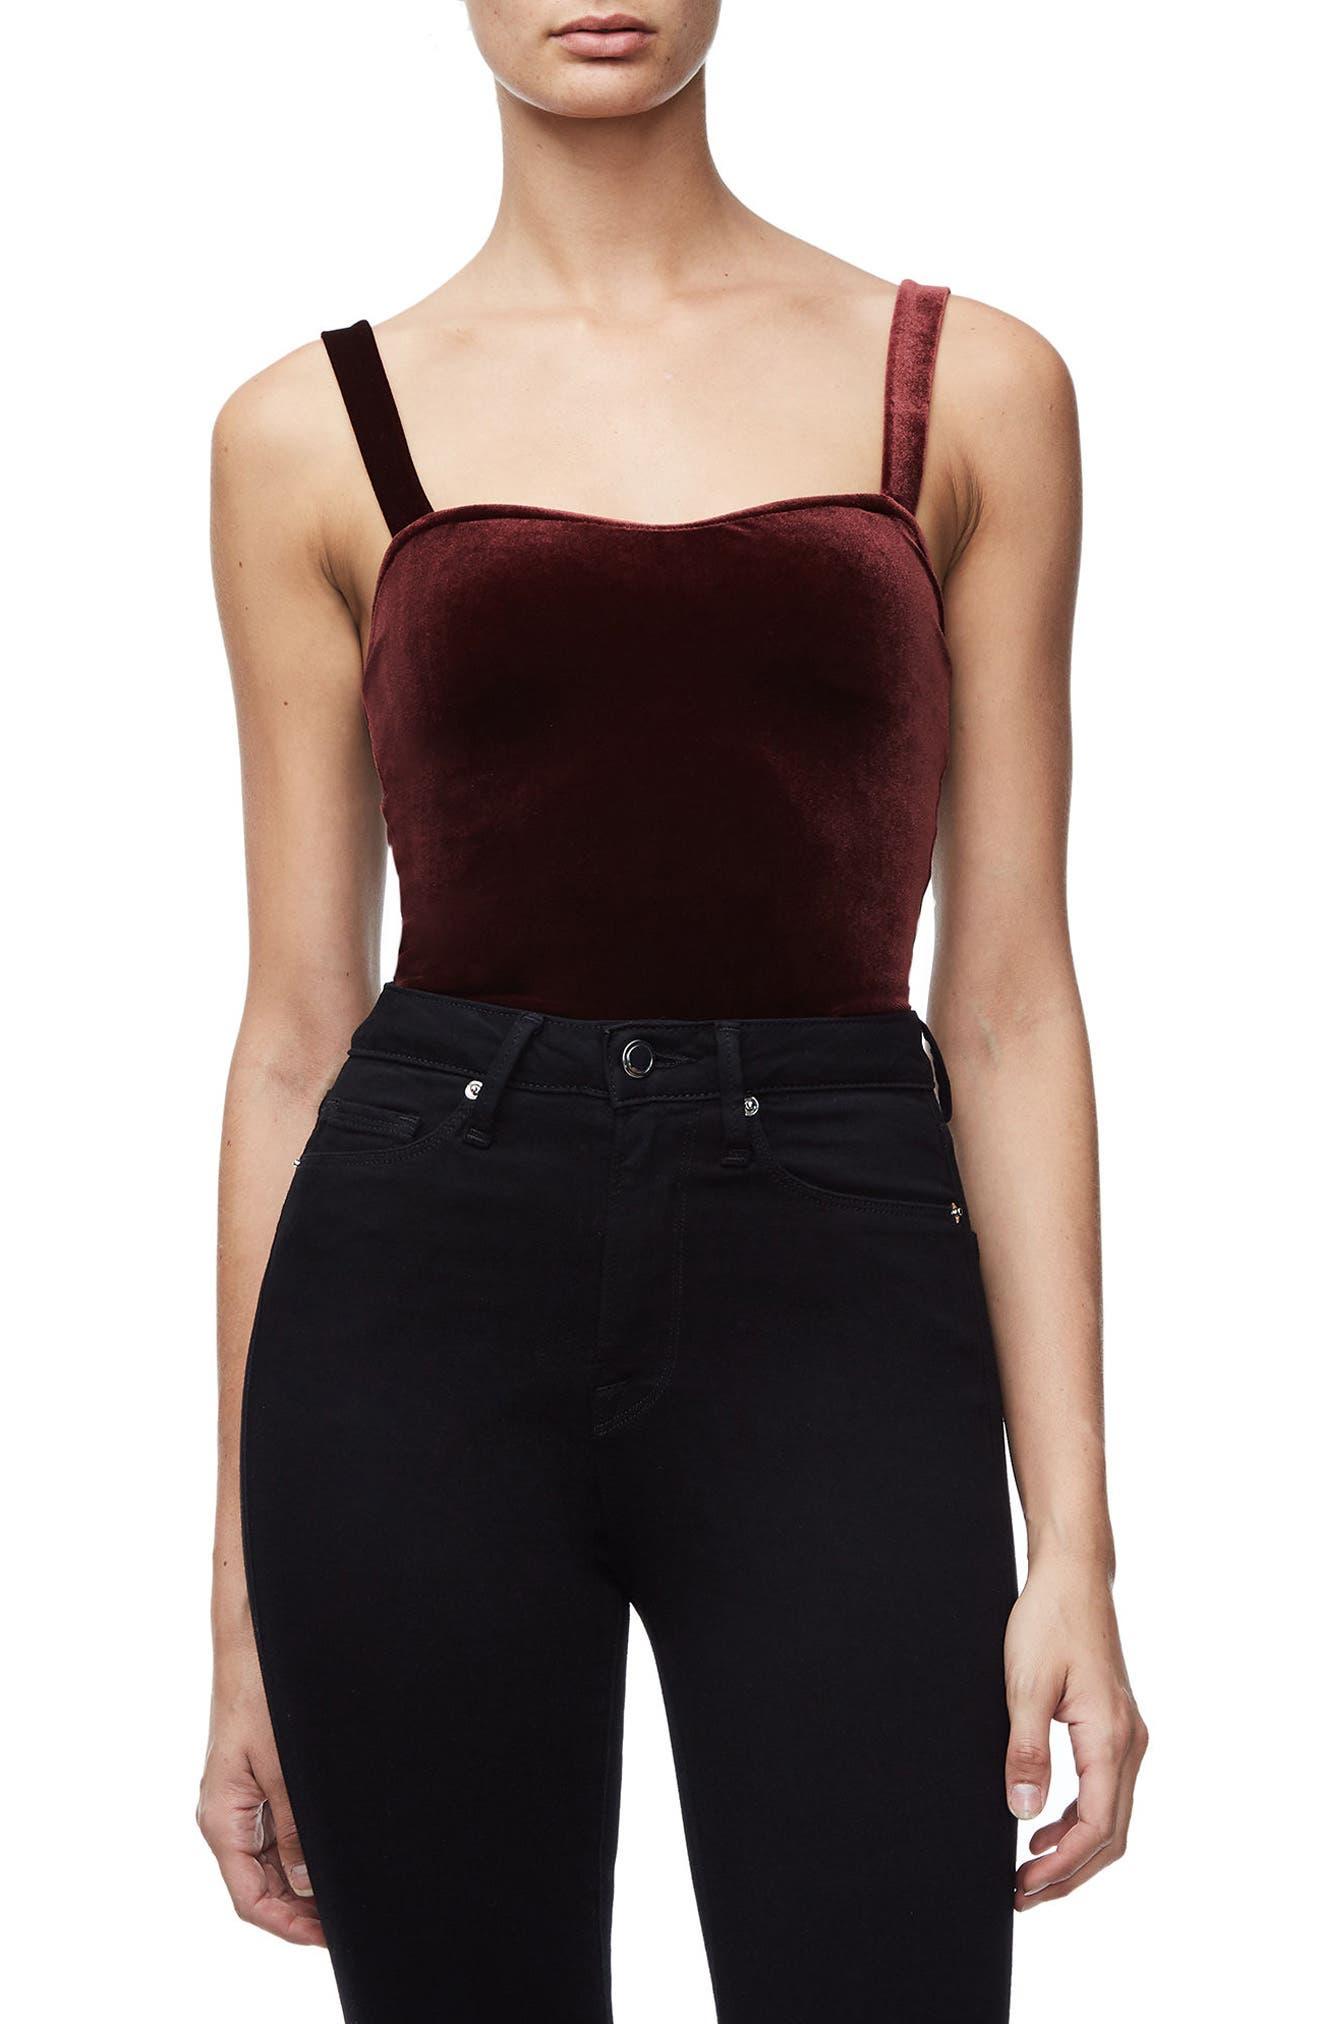 Alternate Image 1 Selected - Good American Sweetheart Bodysuit (Regular & Plus Size)